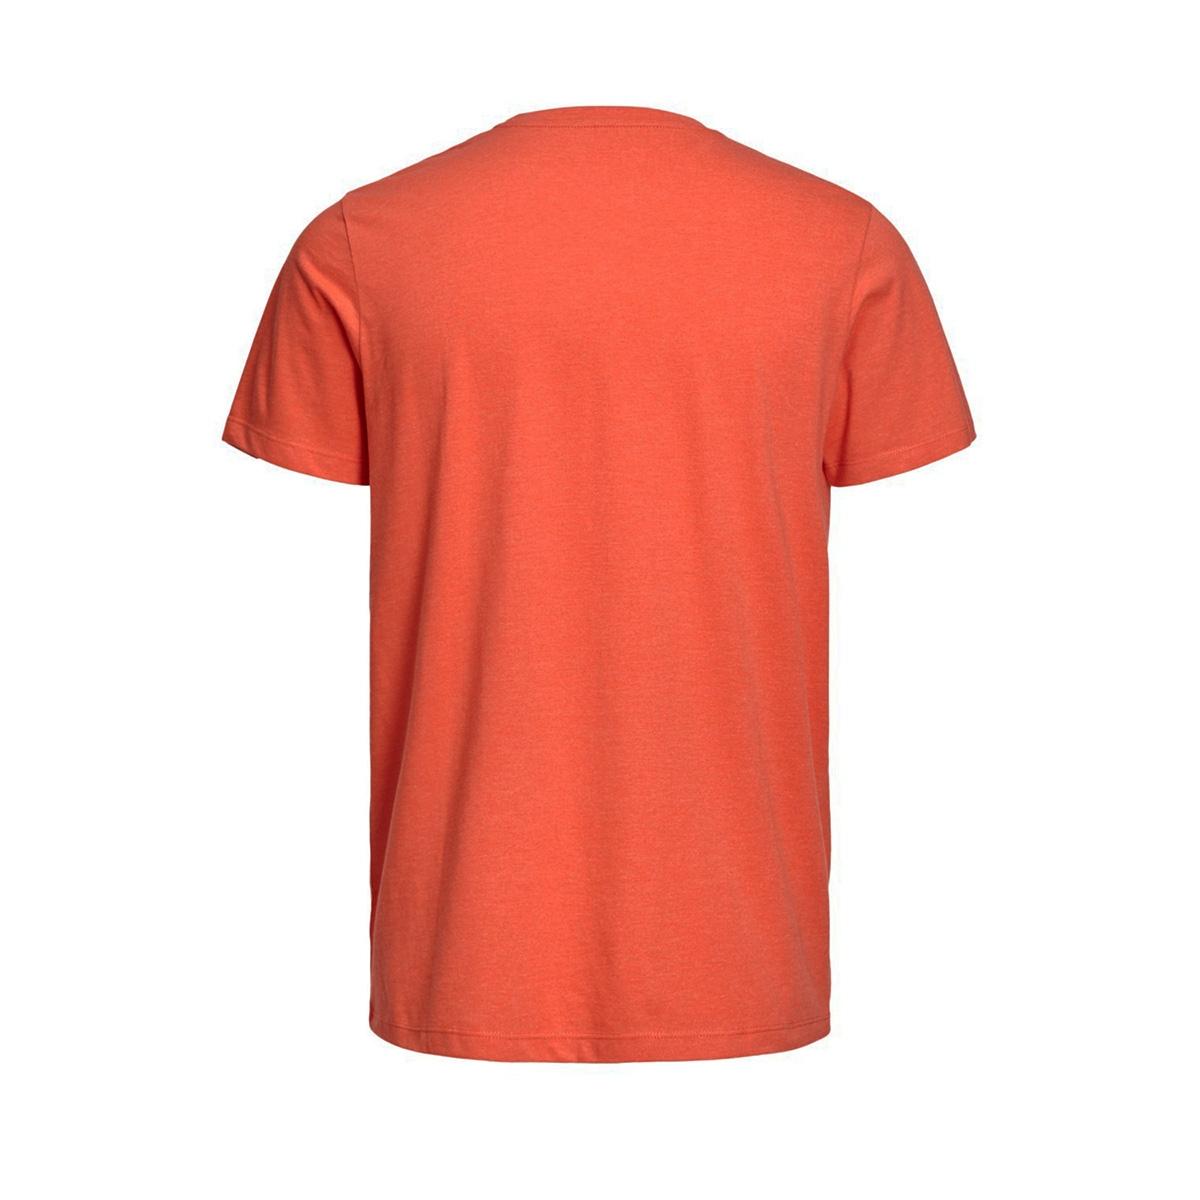 jcobooster tee ss crew neck june 19 12155989 jack & jones t-shirt cherry tomato